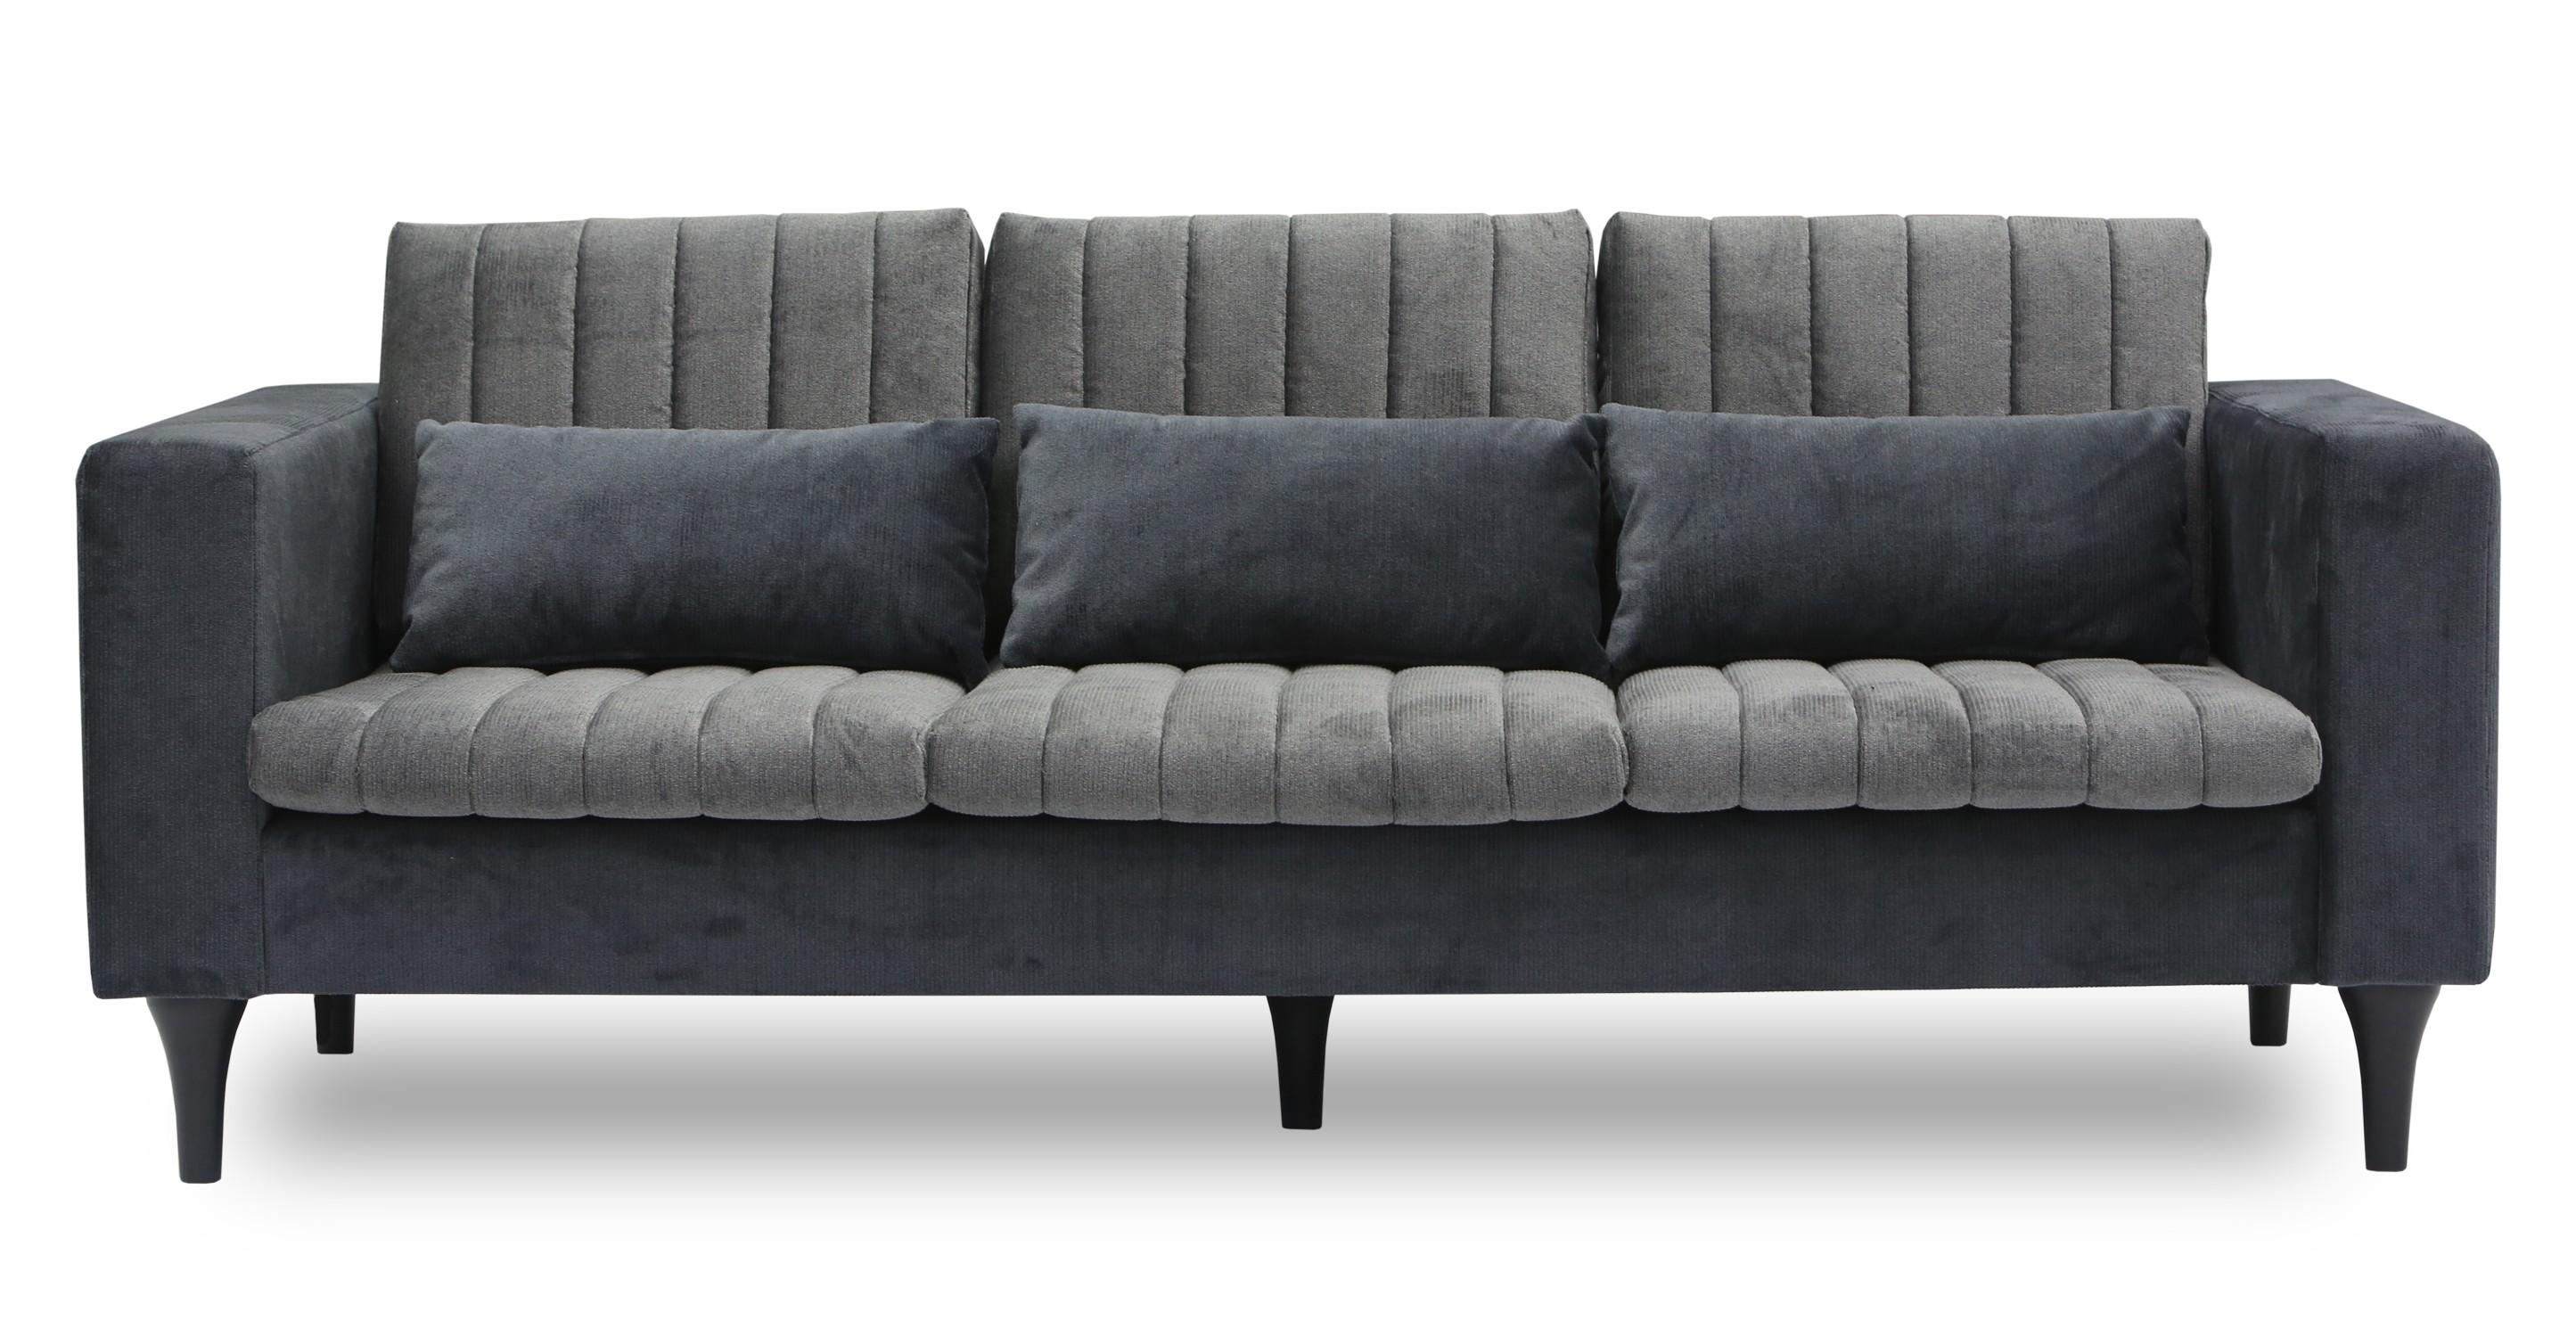 Strip Ash Sofa Sofas Article Modern Mid Century And